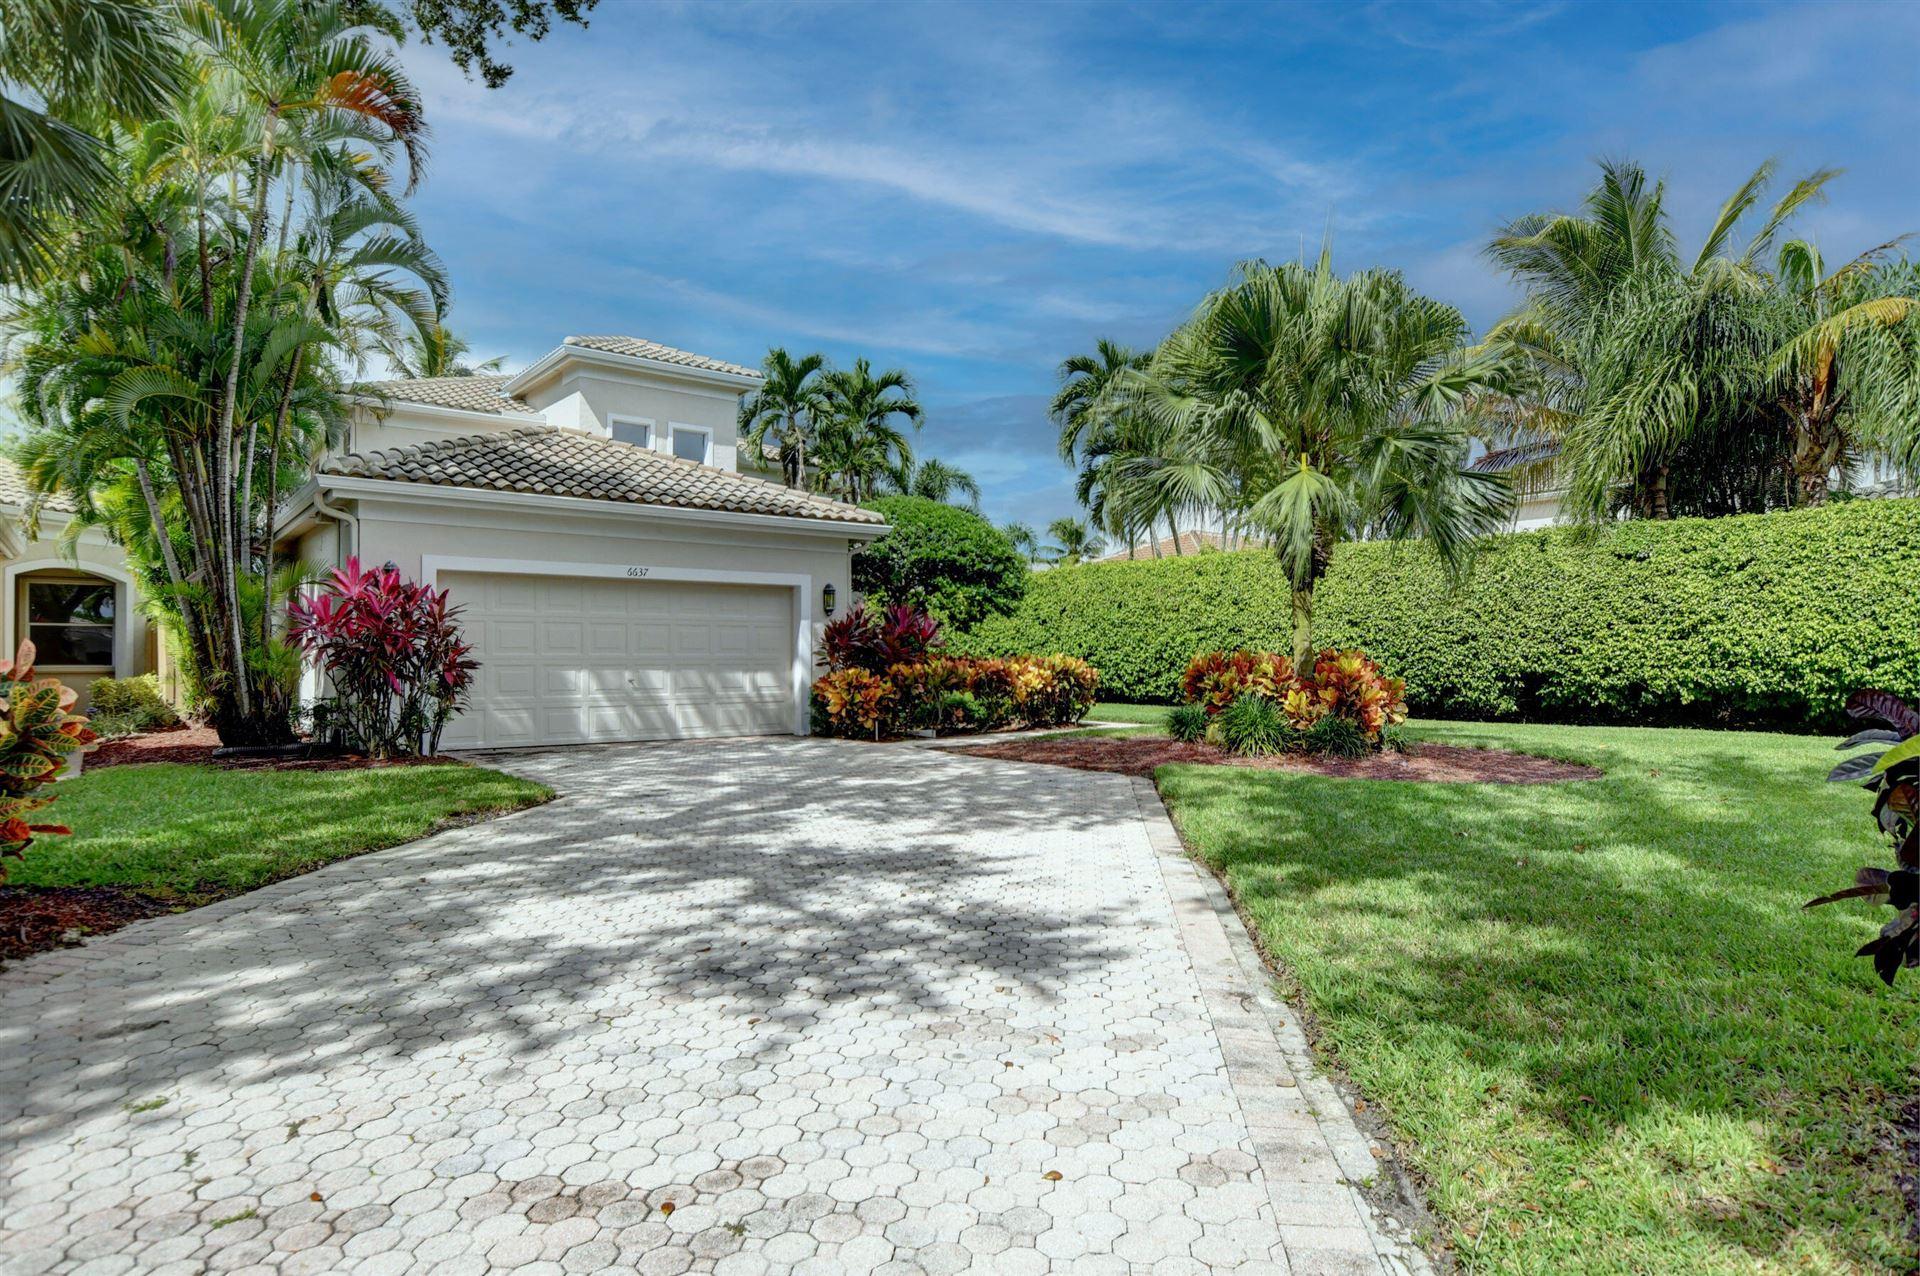 6637 NW 24th Avenue, Boca Raton, FL 33496 - MLS#: RX-10752786